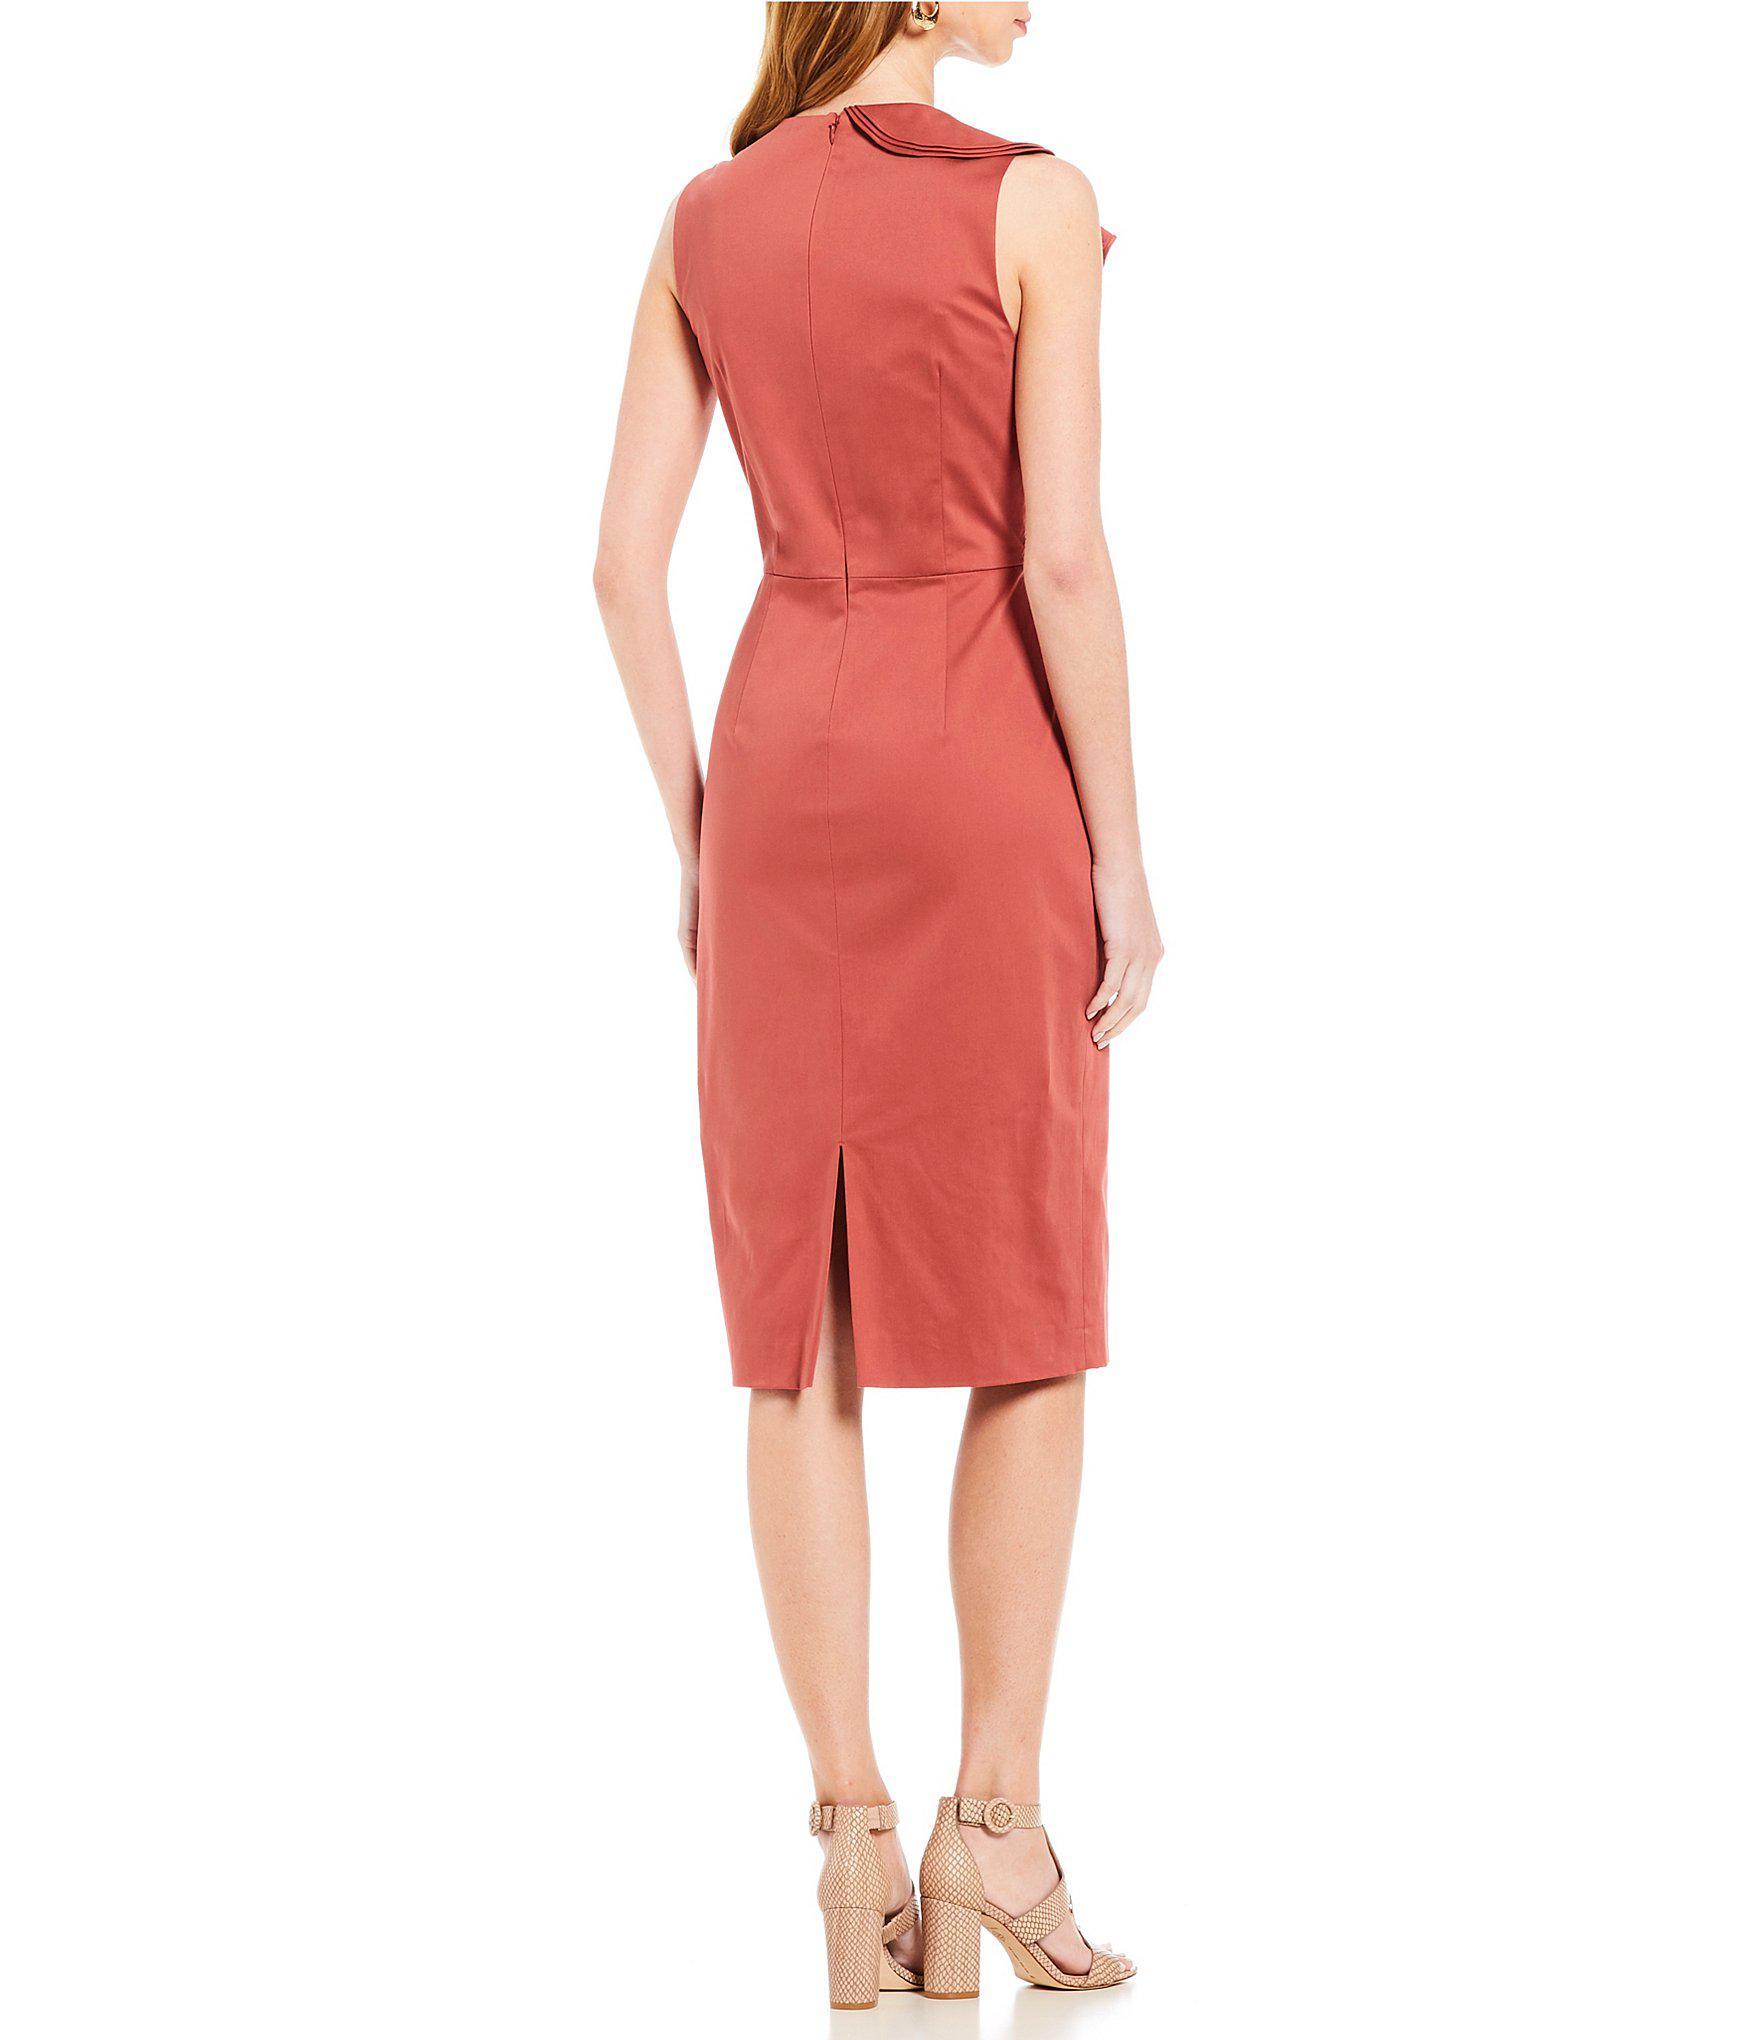 06afd8aba8e Antonio Melani Dresses At Dillards - Gomes Weine AG